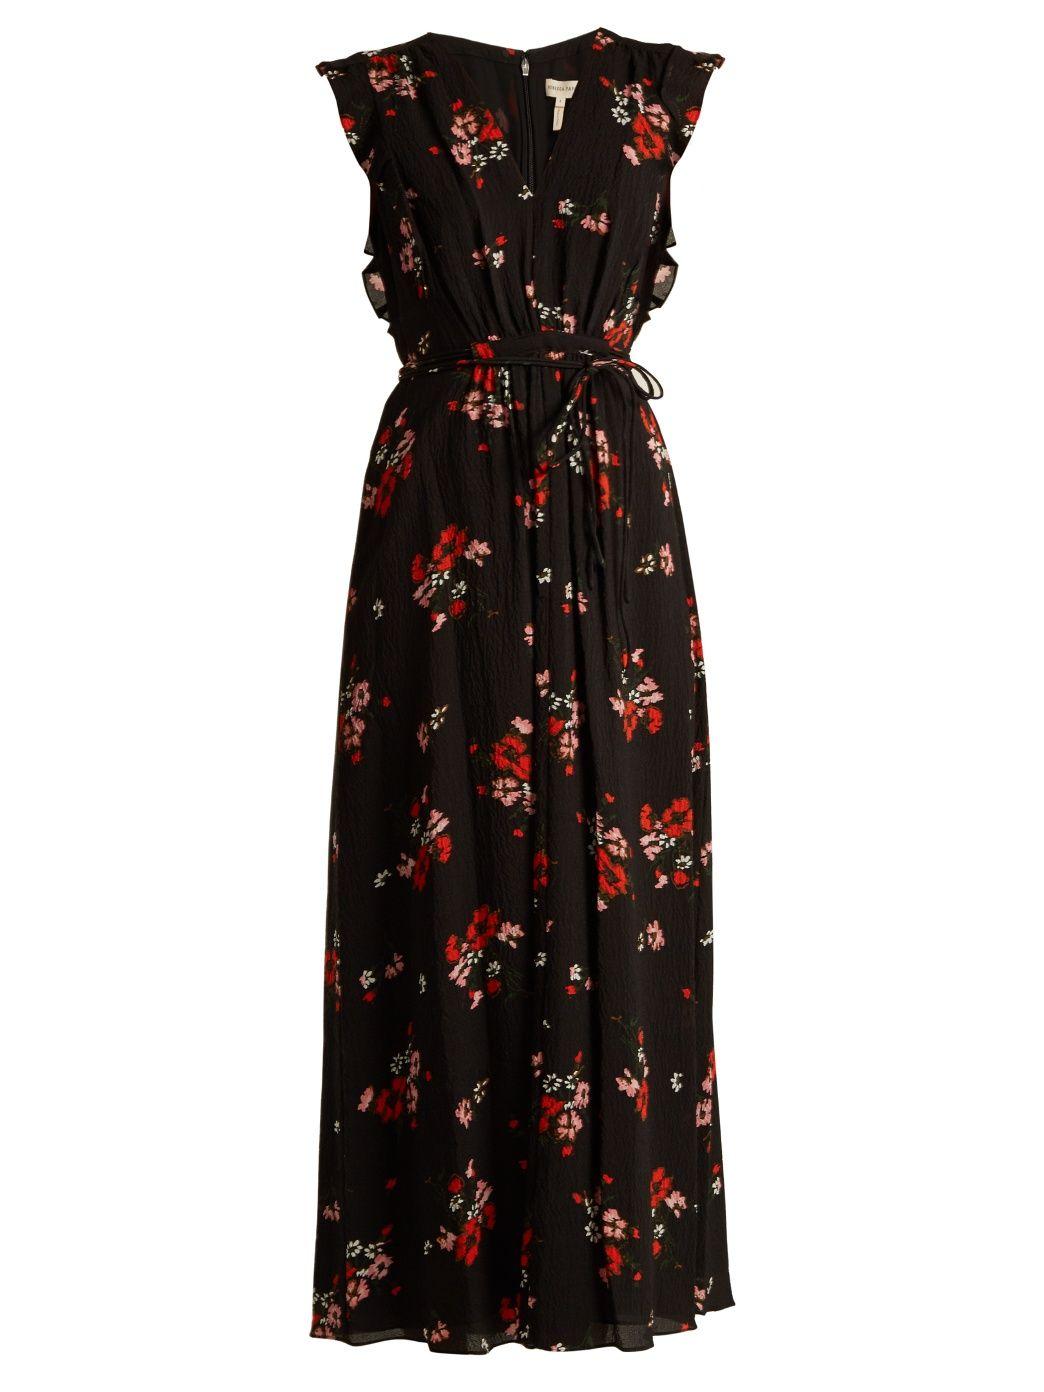 Marguerite floral-print silk-blend crepe dress | Rebecca Taylor | MATCHESFASHION.COM